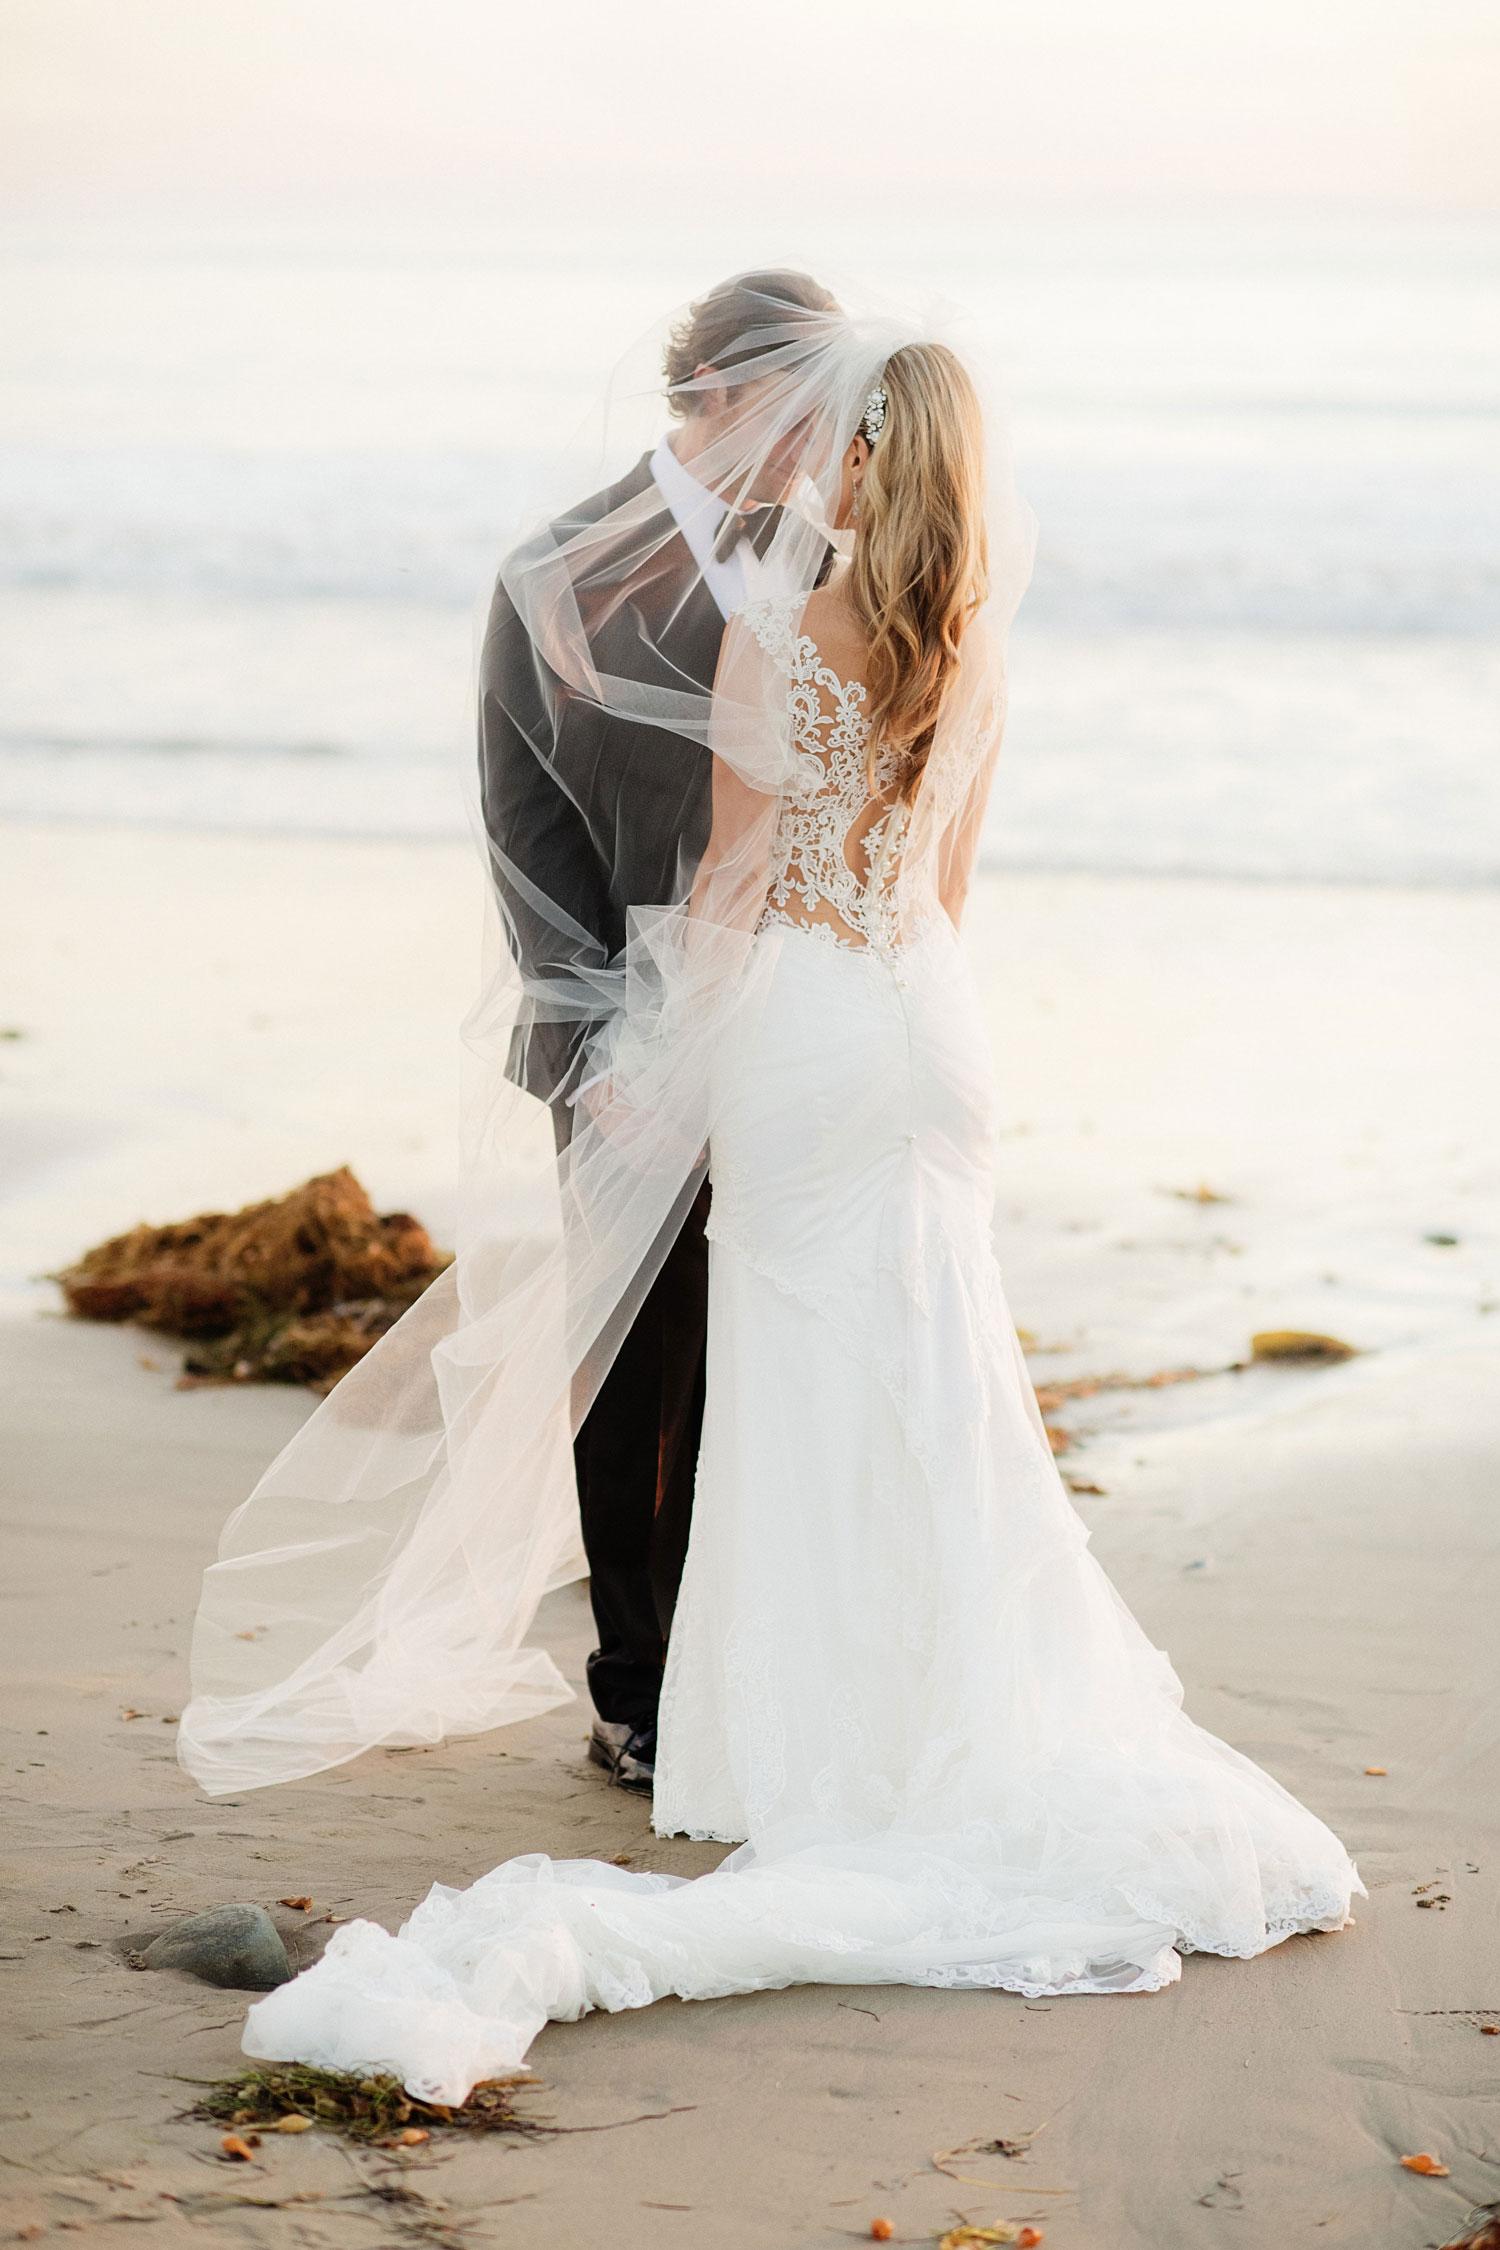 amy crawford and gerrit cole real wedding santa barbara beach portrait